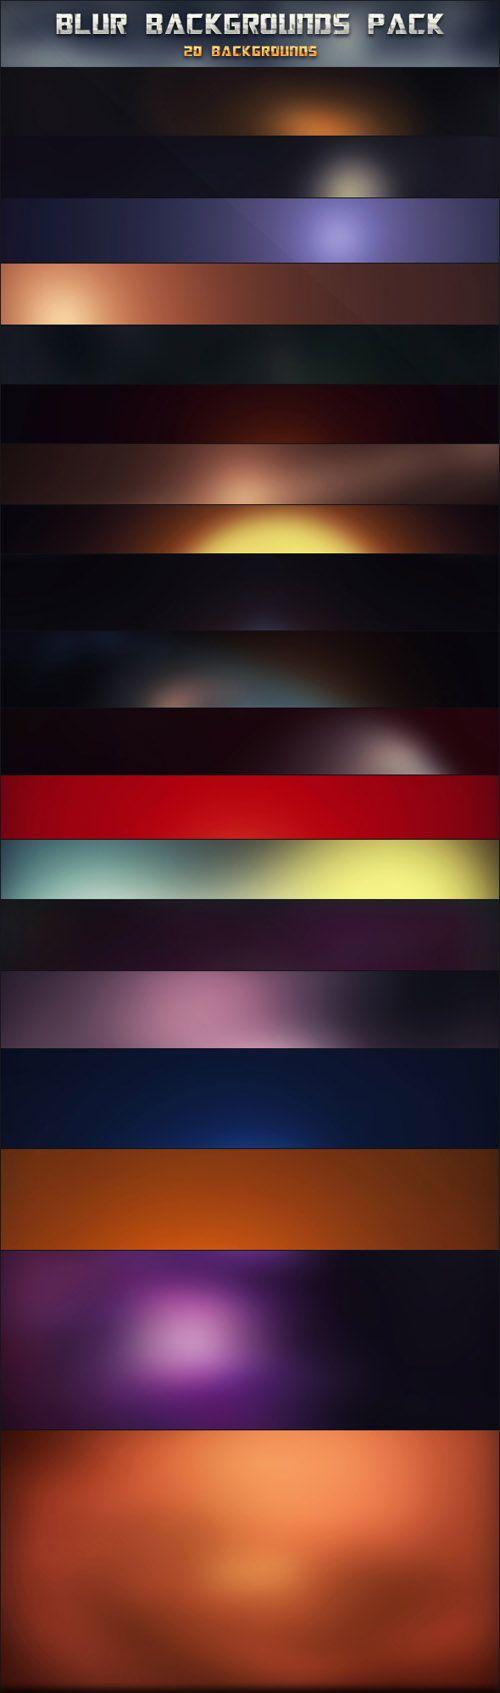 20 HD Blur Backgrounds Set 20 JPG | 2600x1600 PIX | 5 MB